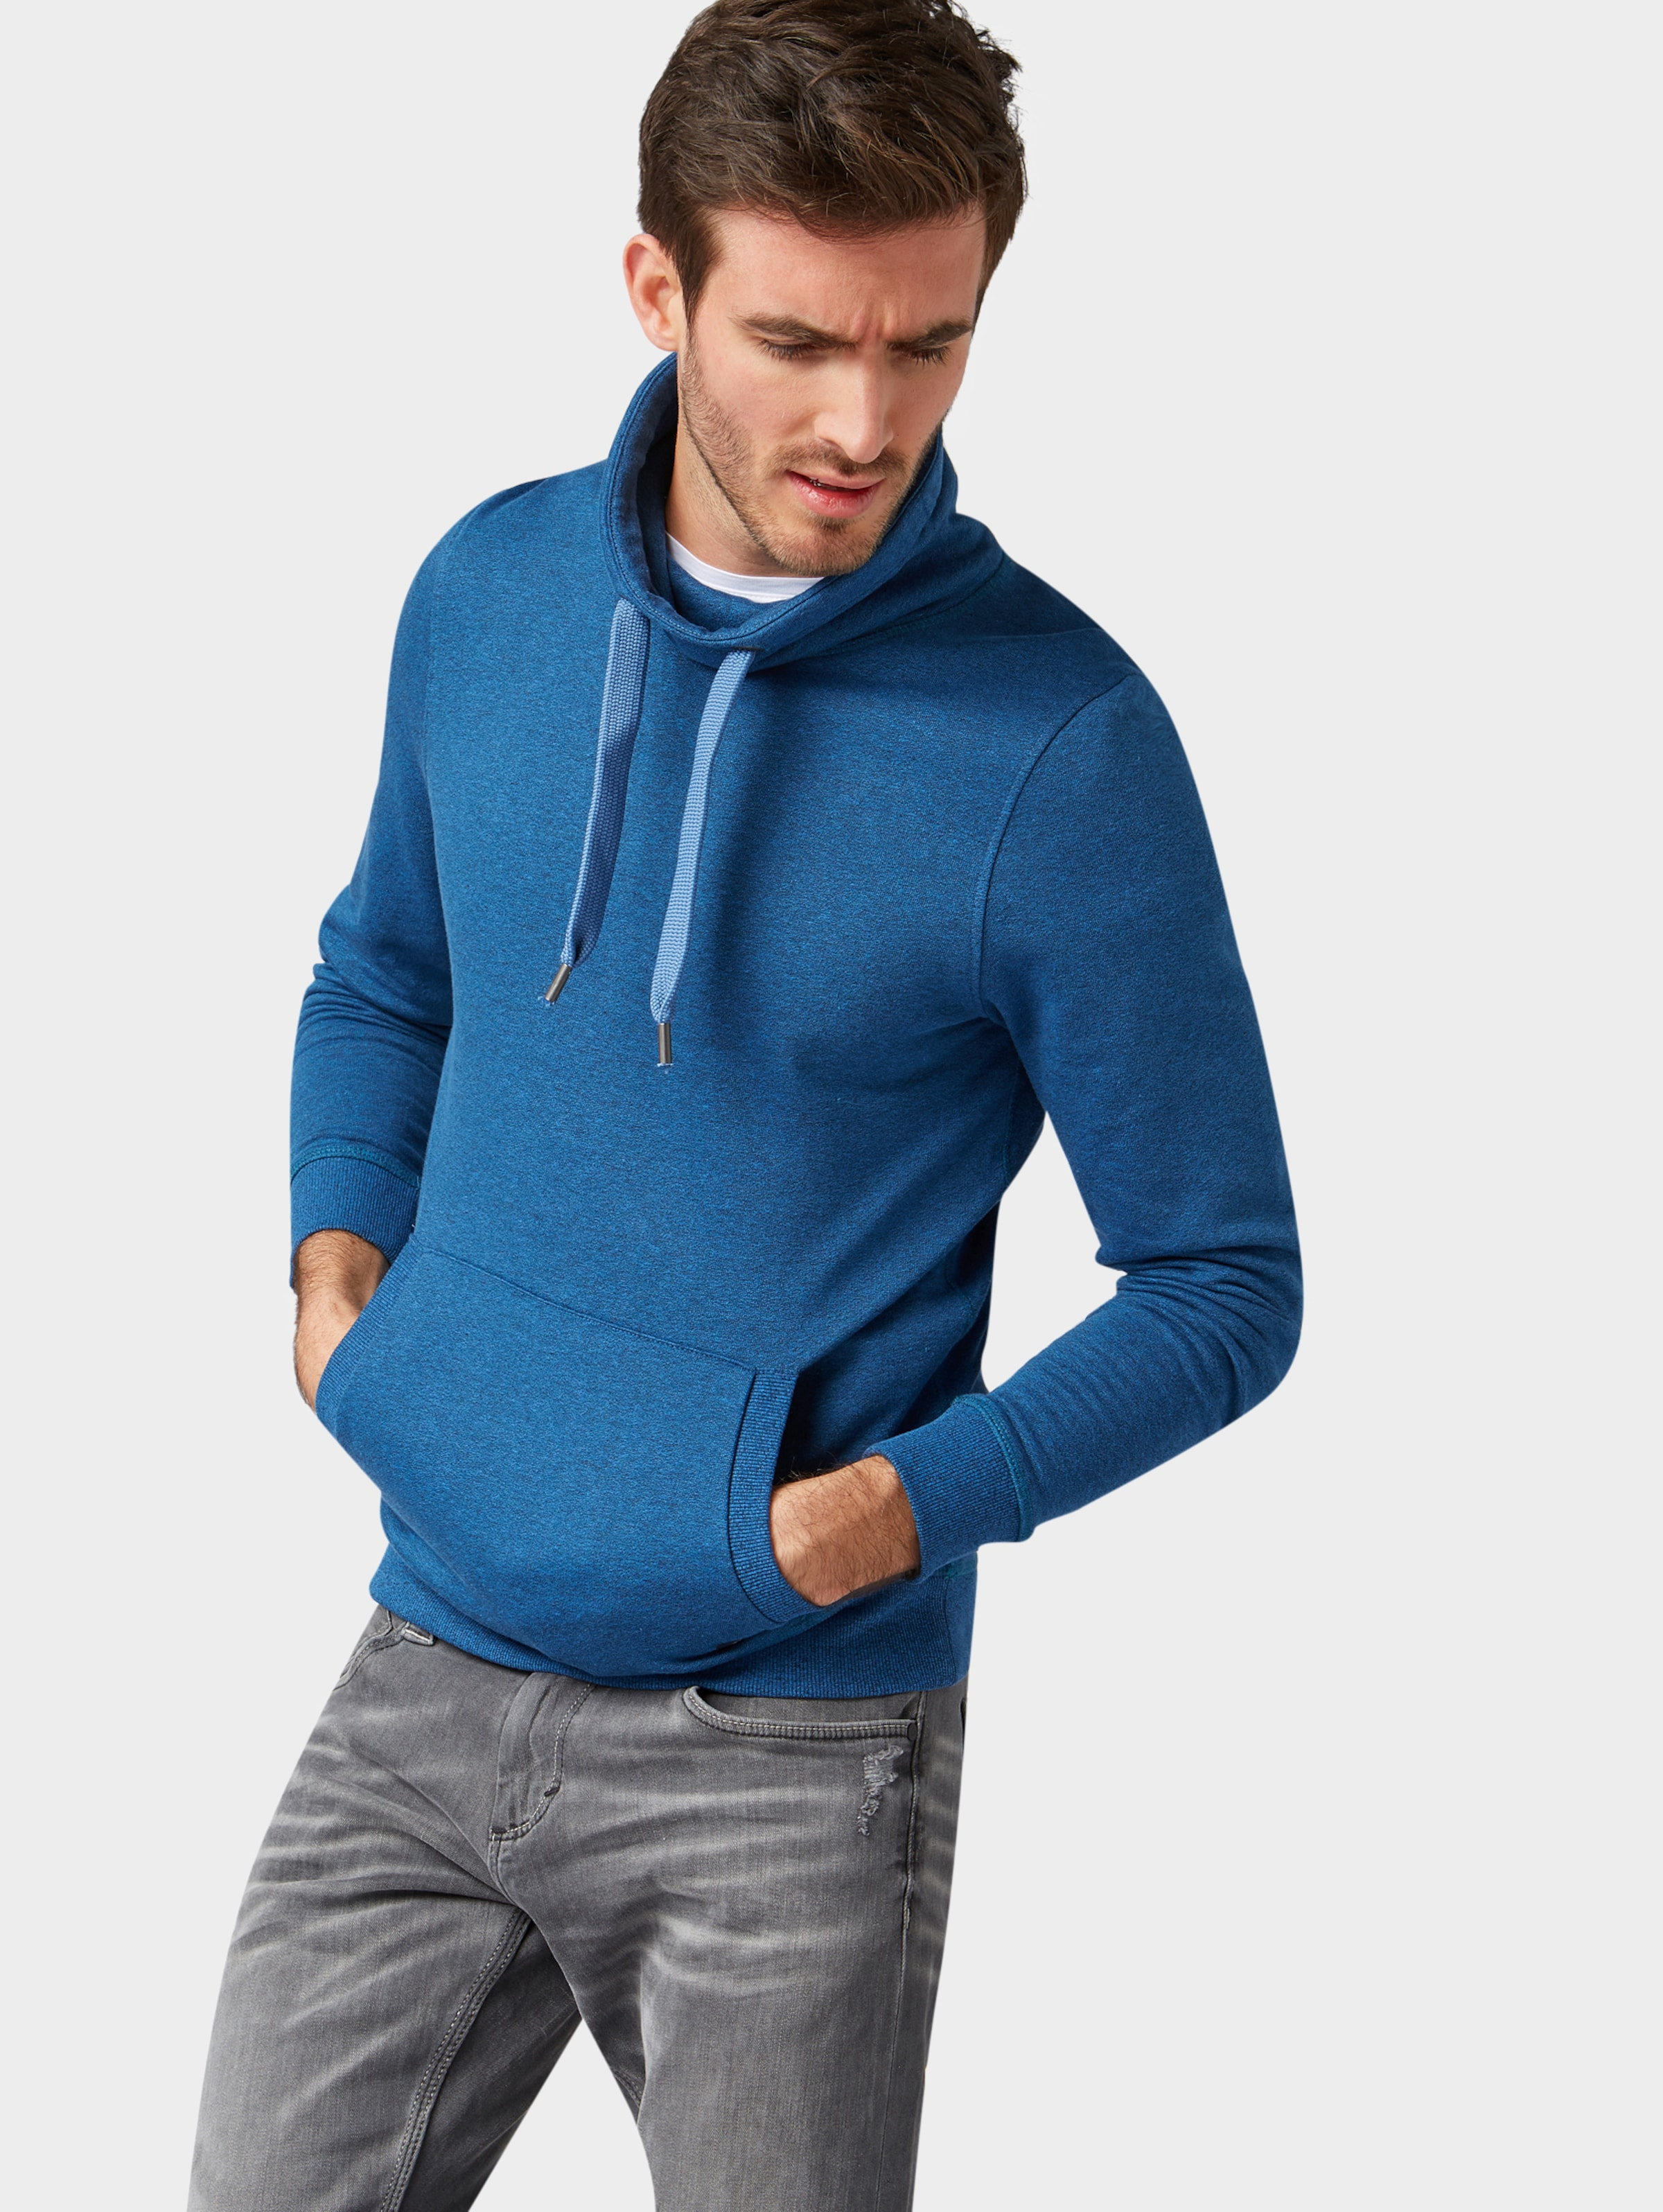 Royalblau In Tom Sweatshirt Tailor Tailor Sweatshirt Tom In 4Lc5ASRjq3